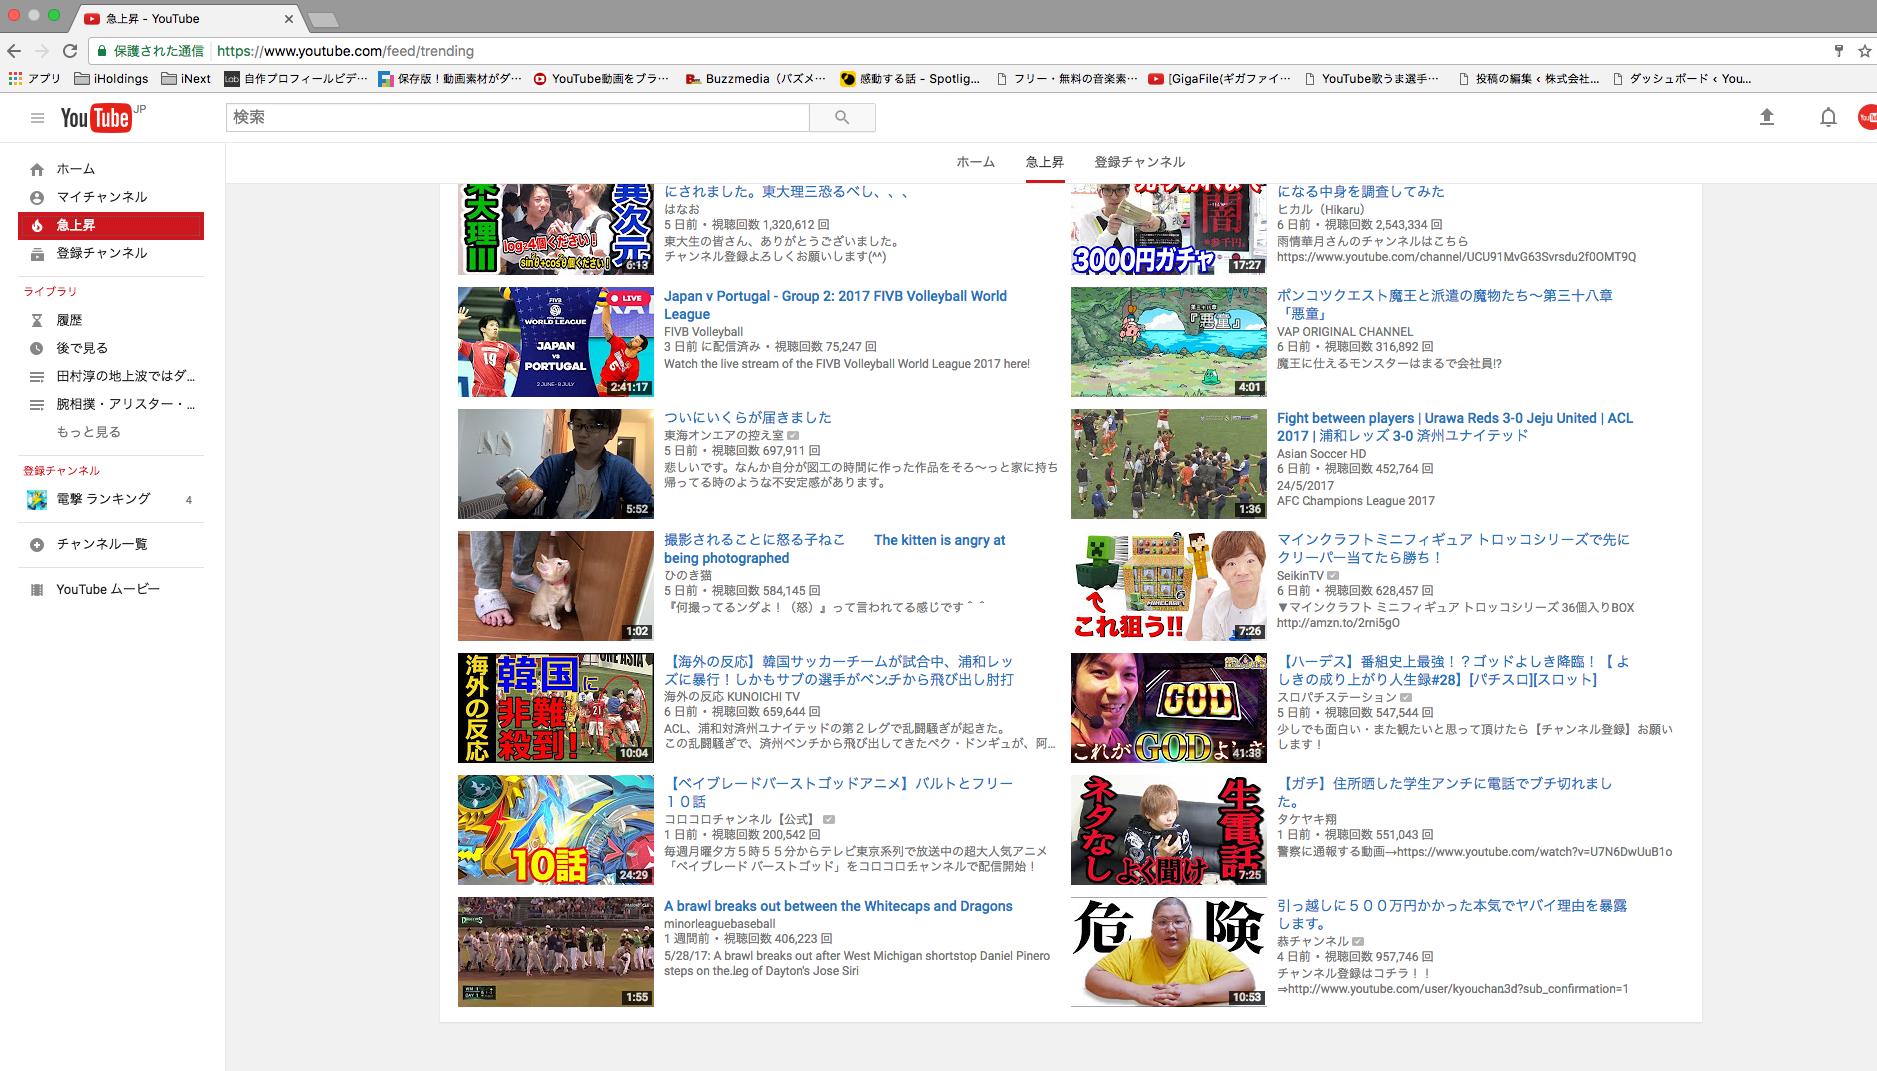 YouTubeの基本